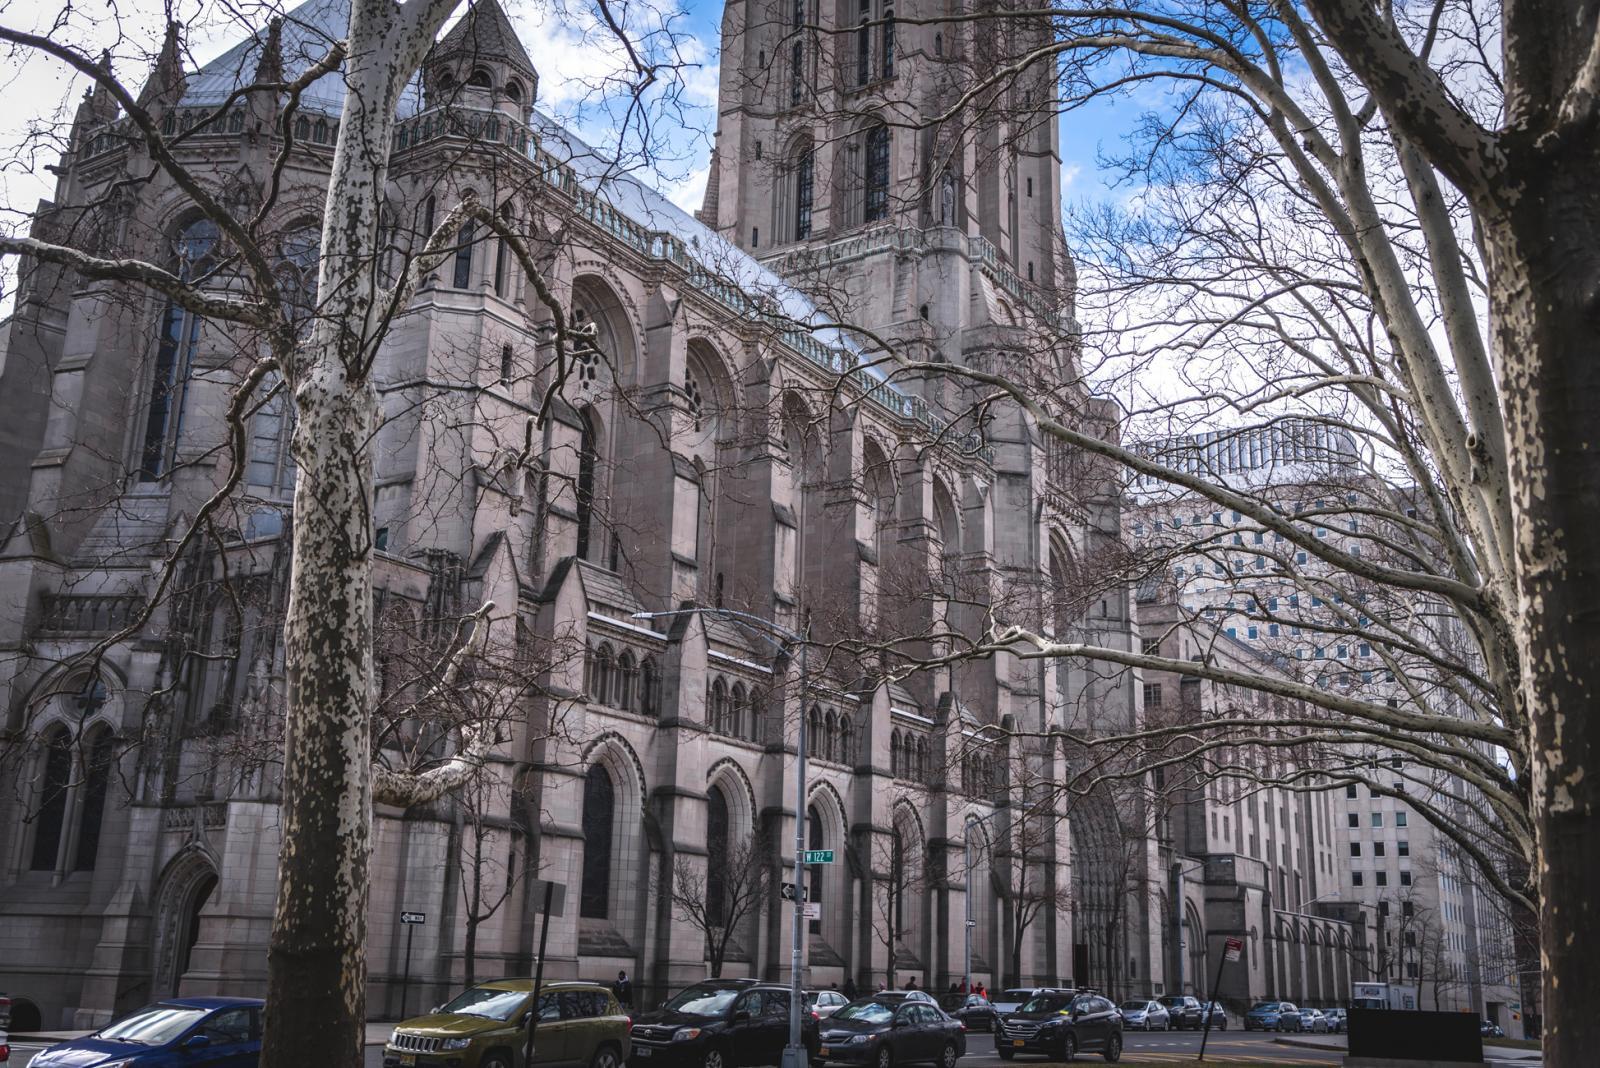 NYC Sightseeing Tour